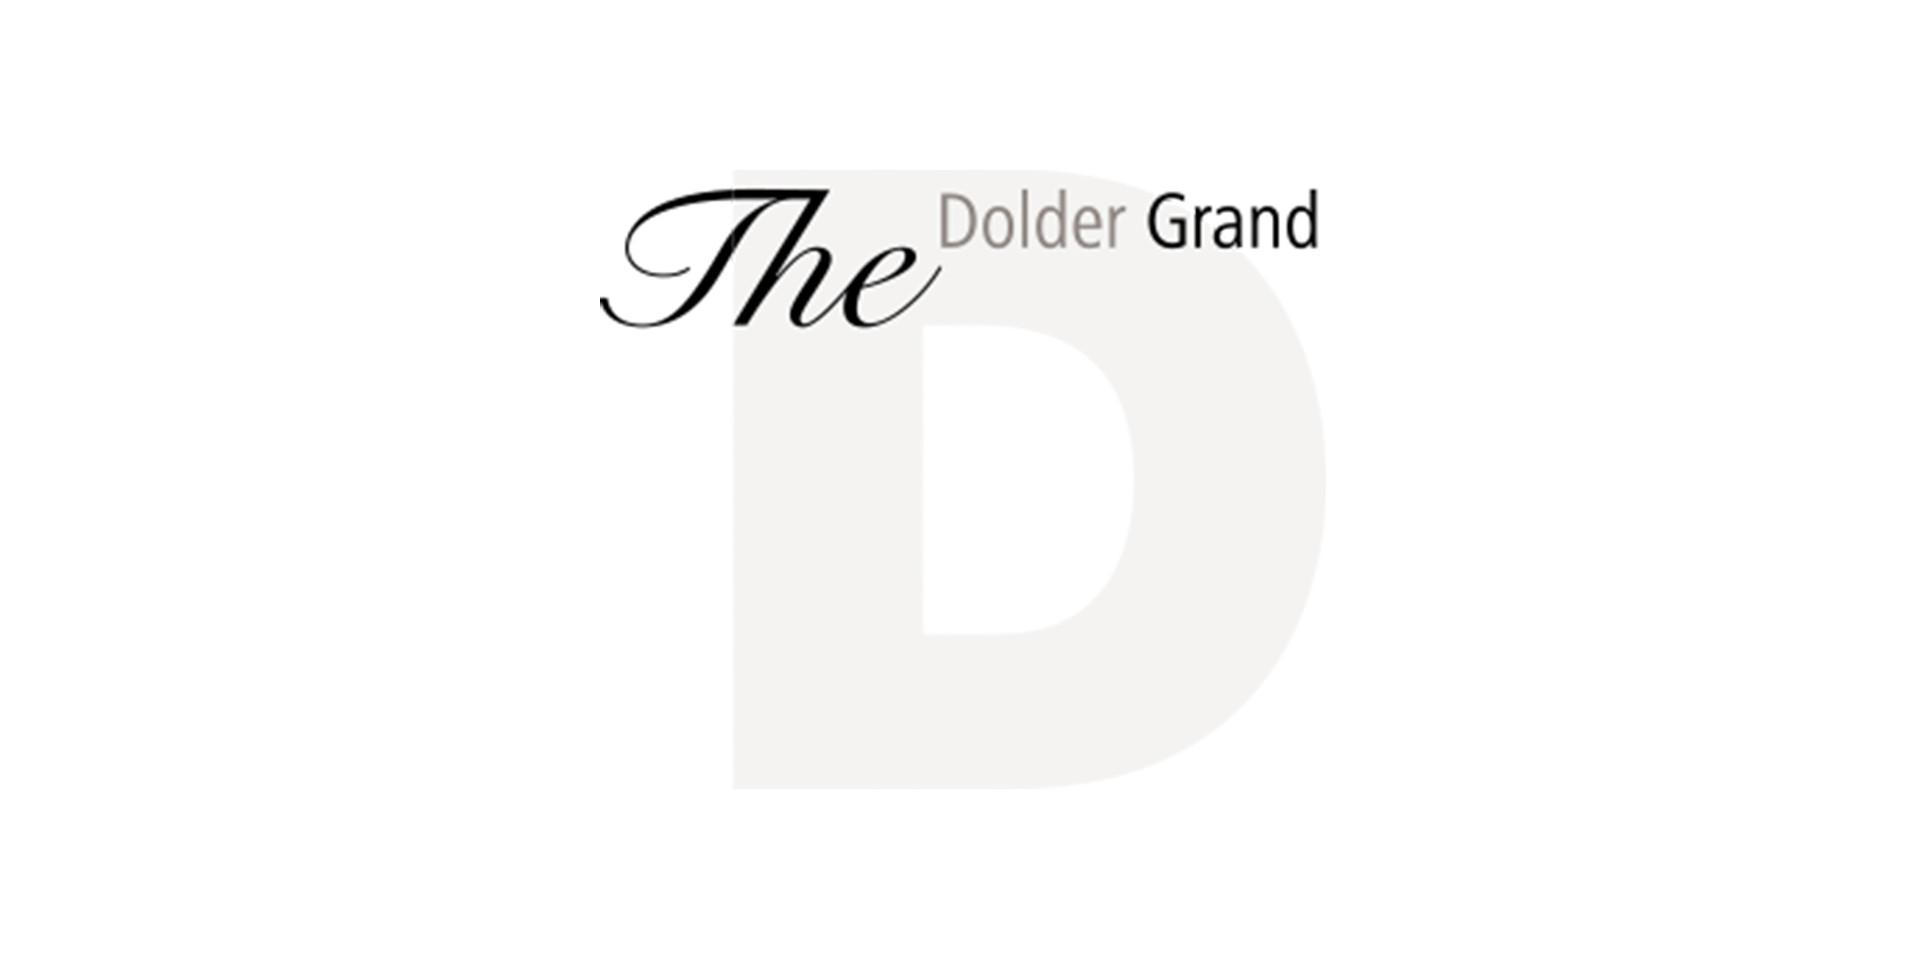 The Dolder Grand